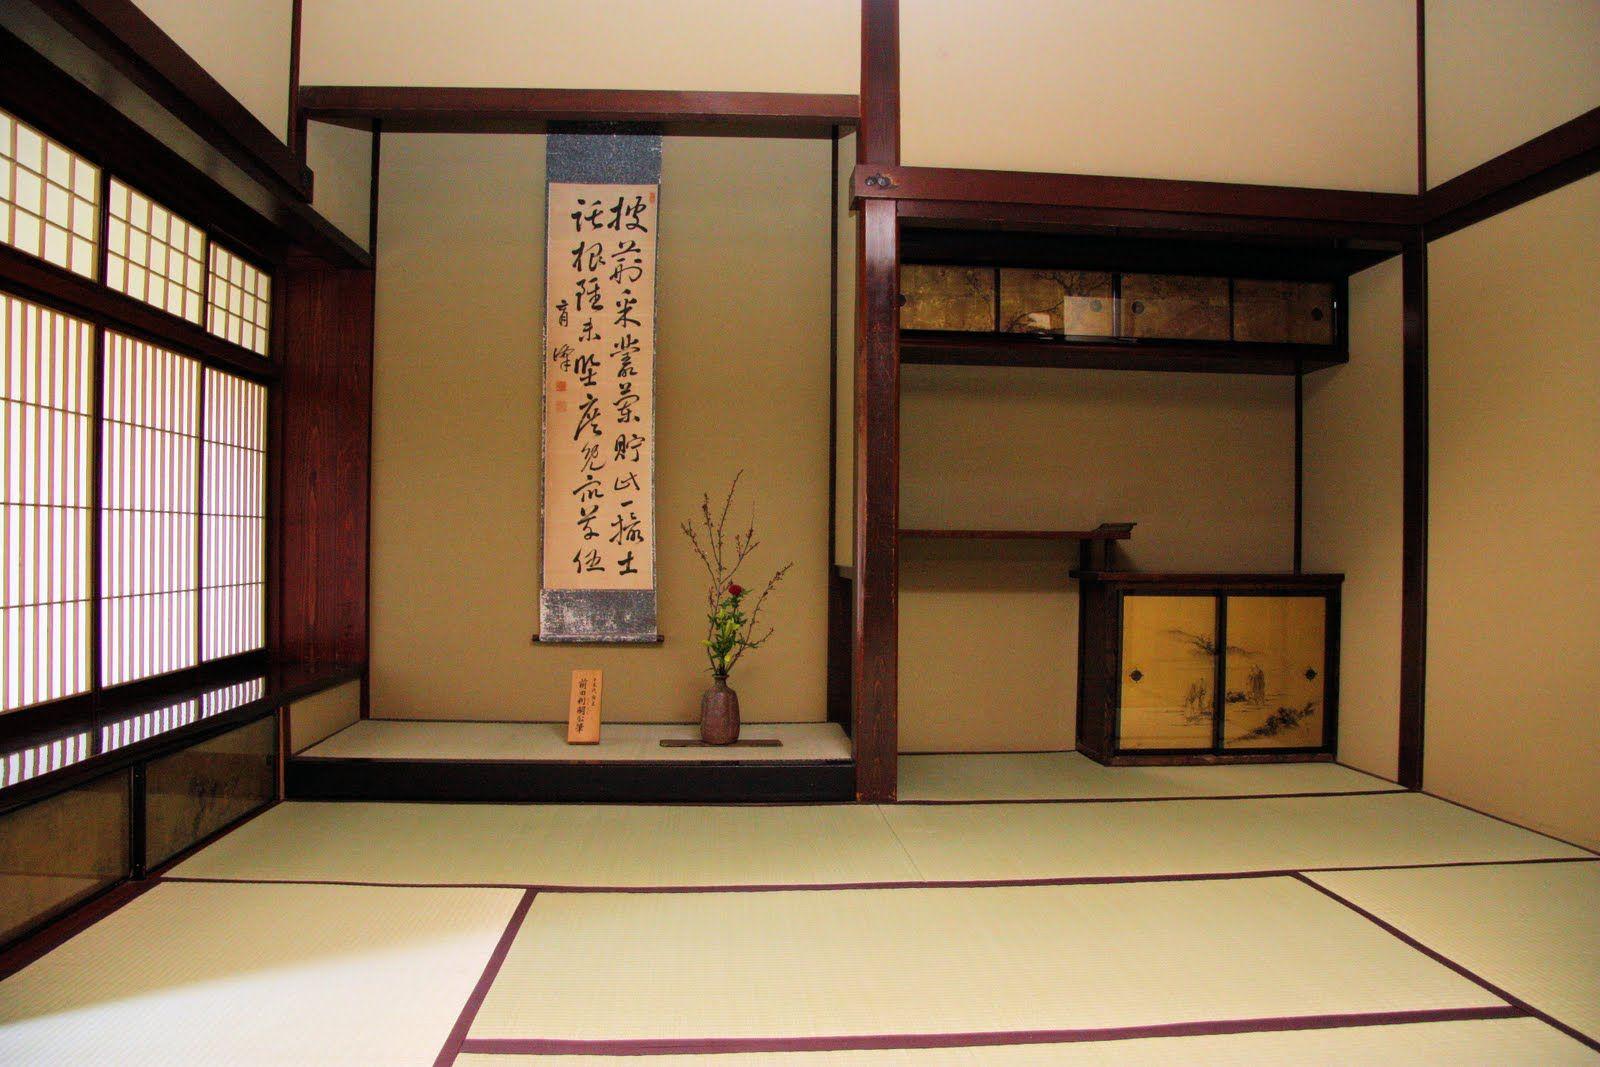 ikebana tokonoma are several stories about the origin of tokonoma and its - Chambre Japonaise Tatami